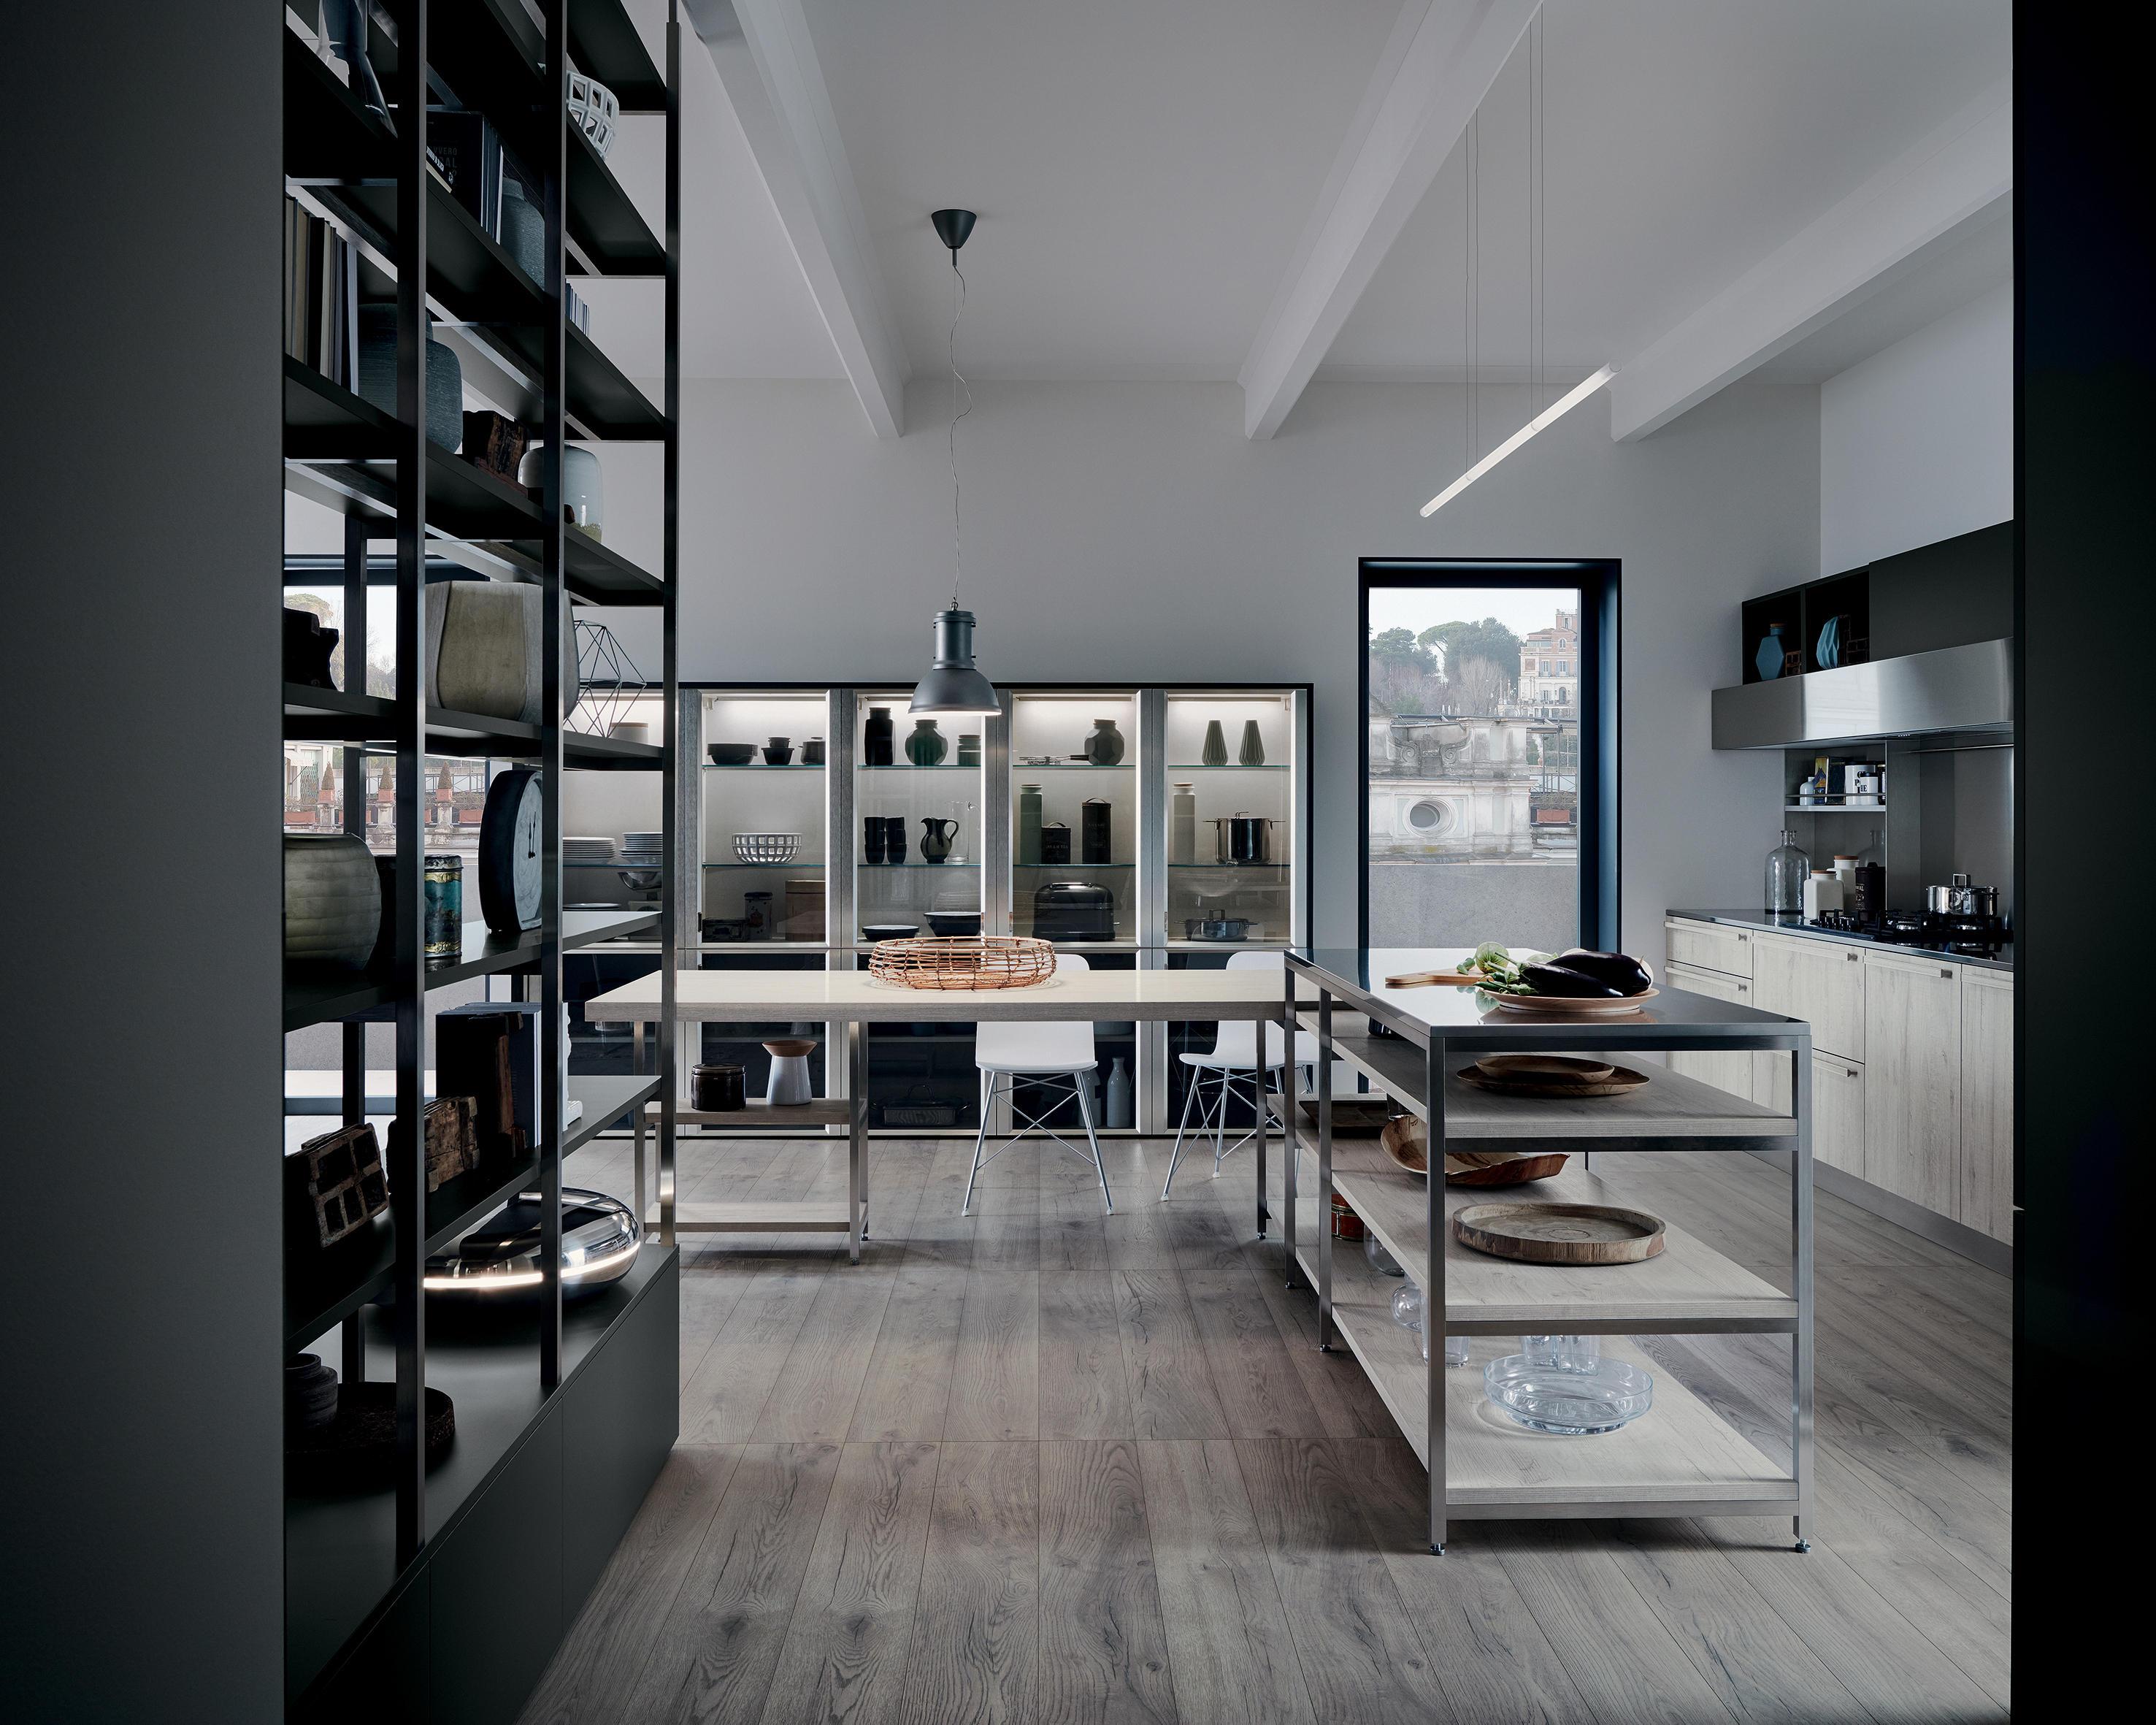 ETHICA - Cucine a parete Veneta Cucine | Architonic